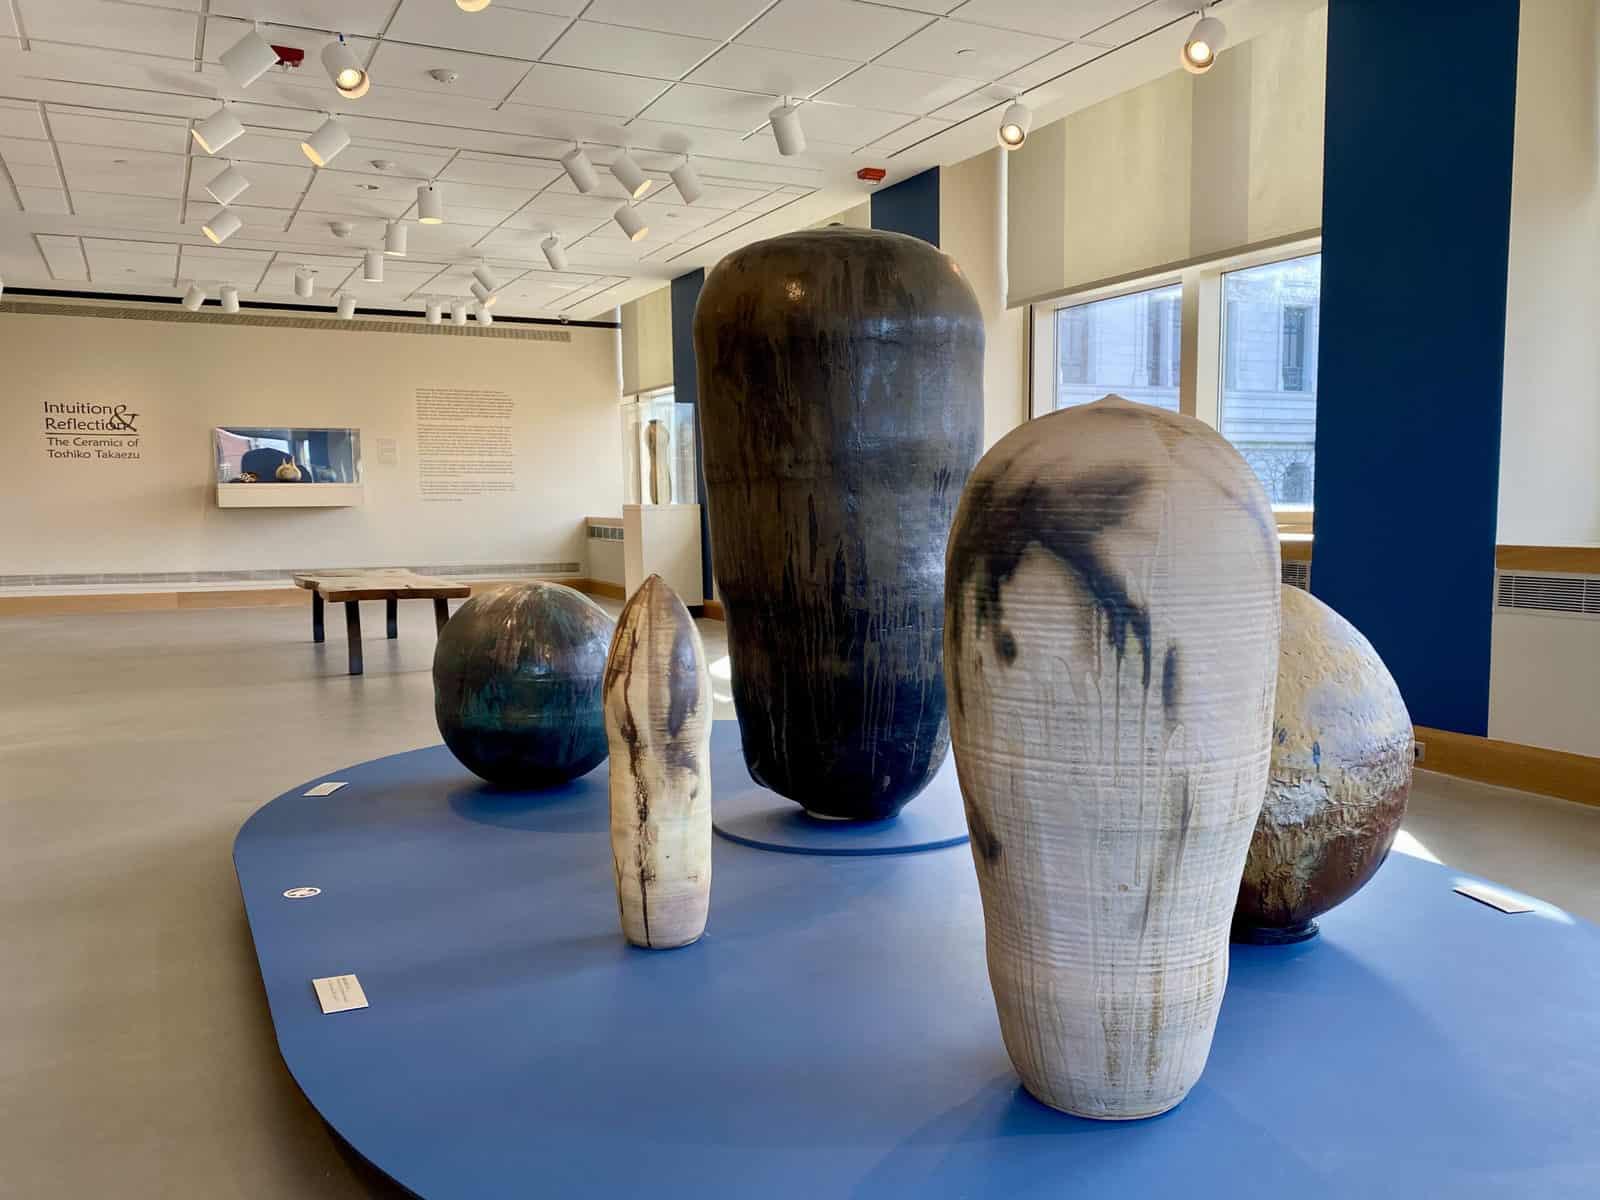 Intuition & Reflection: The Ceramics of Toshiko Takaezu